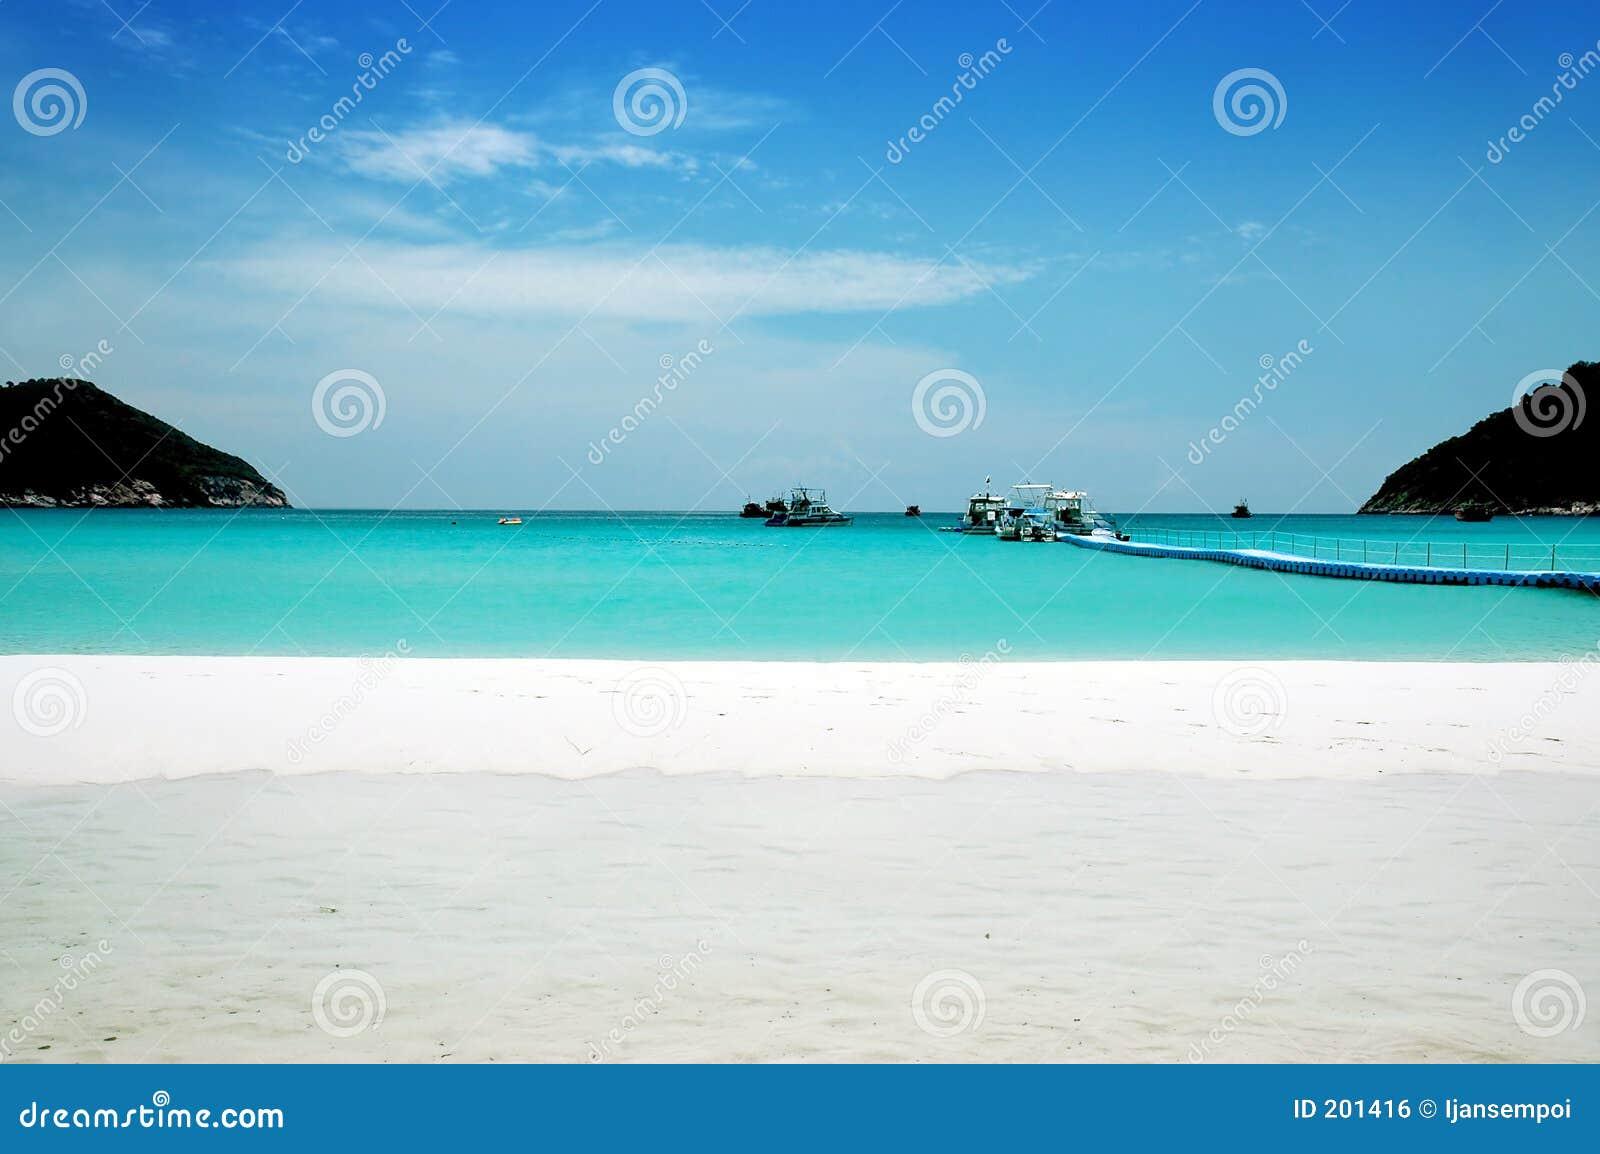 the beautiful seaside scenery - photo #22